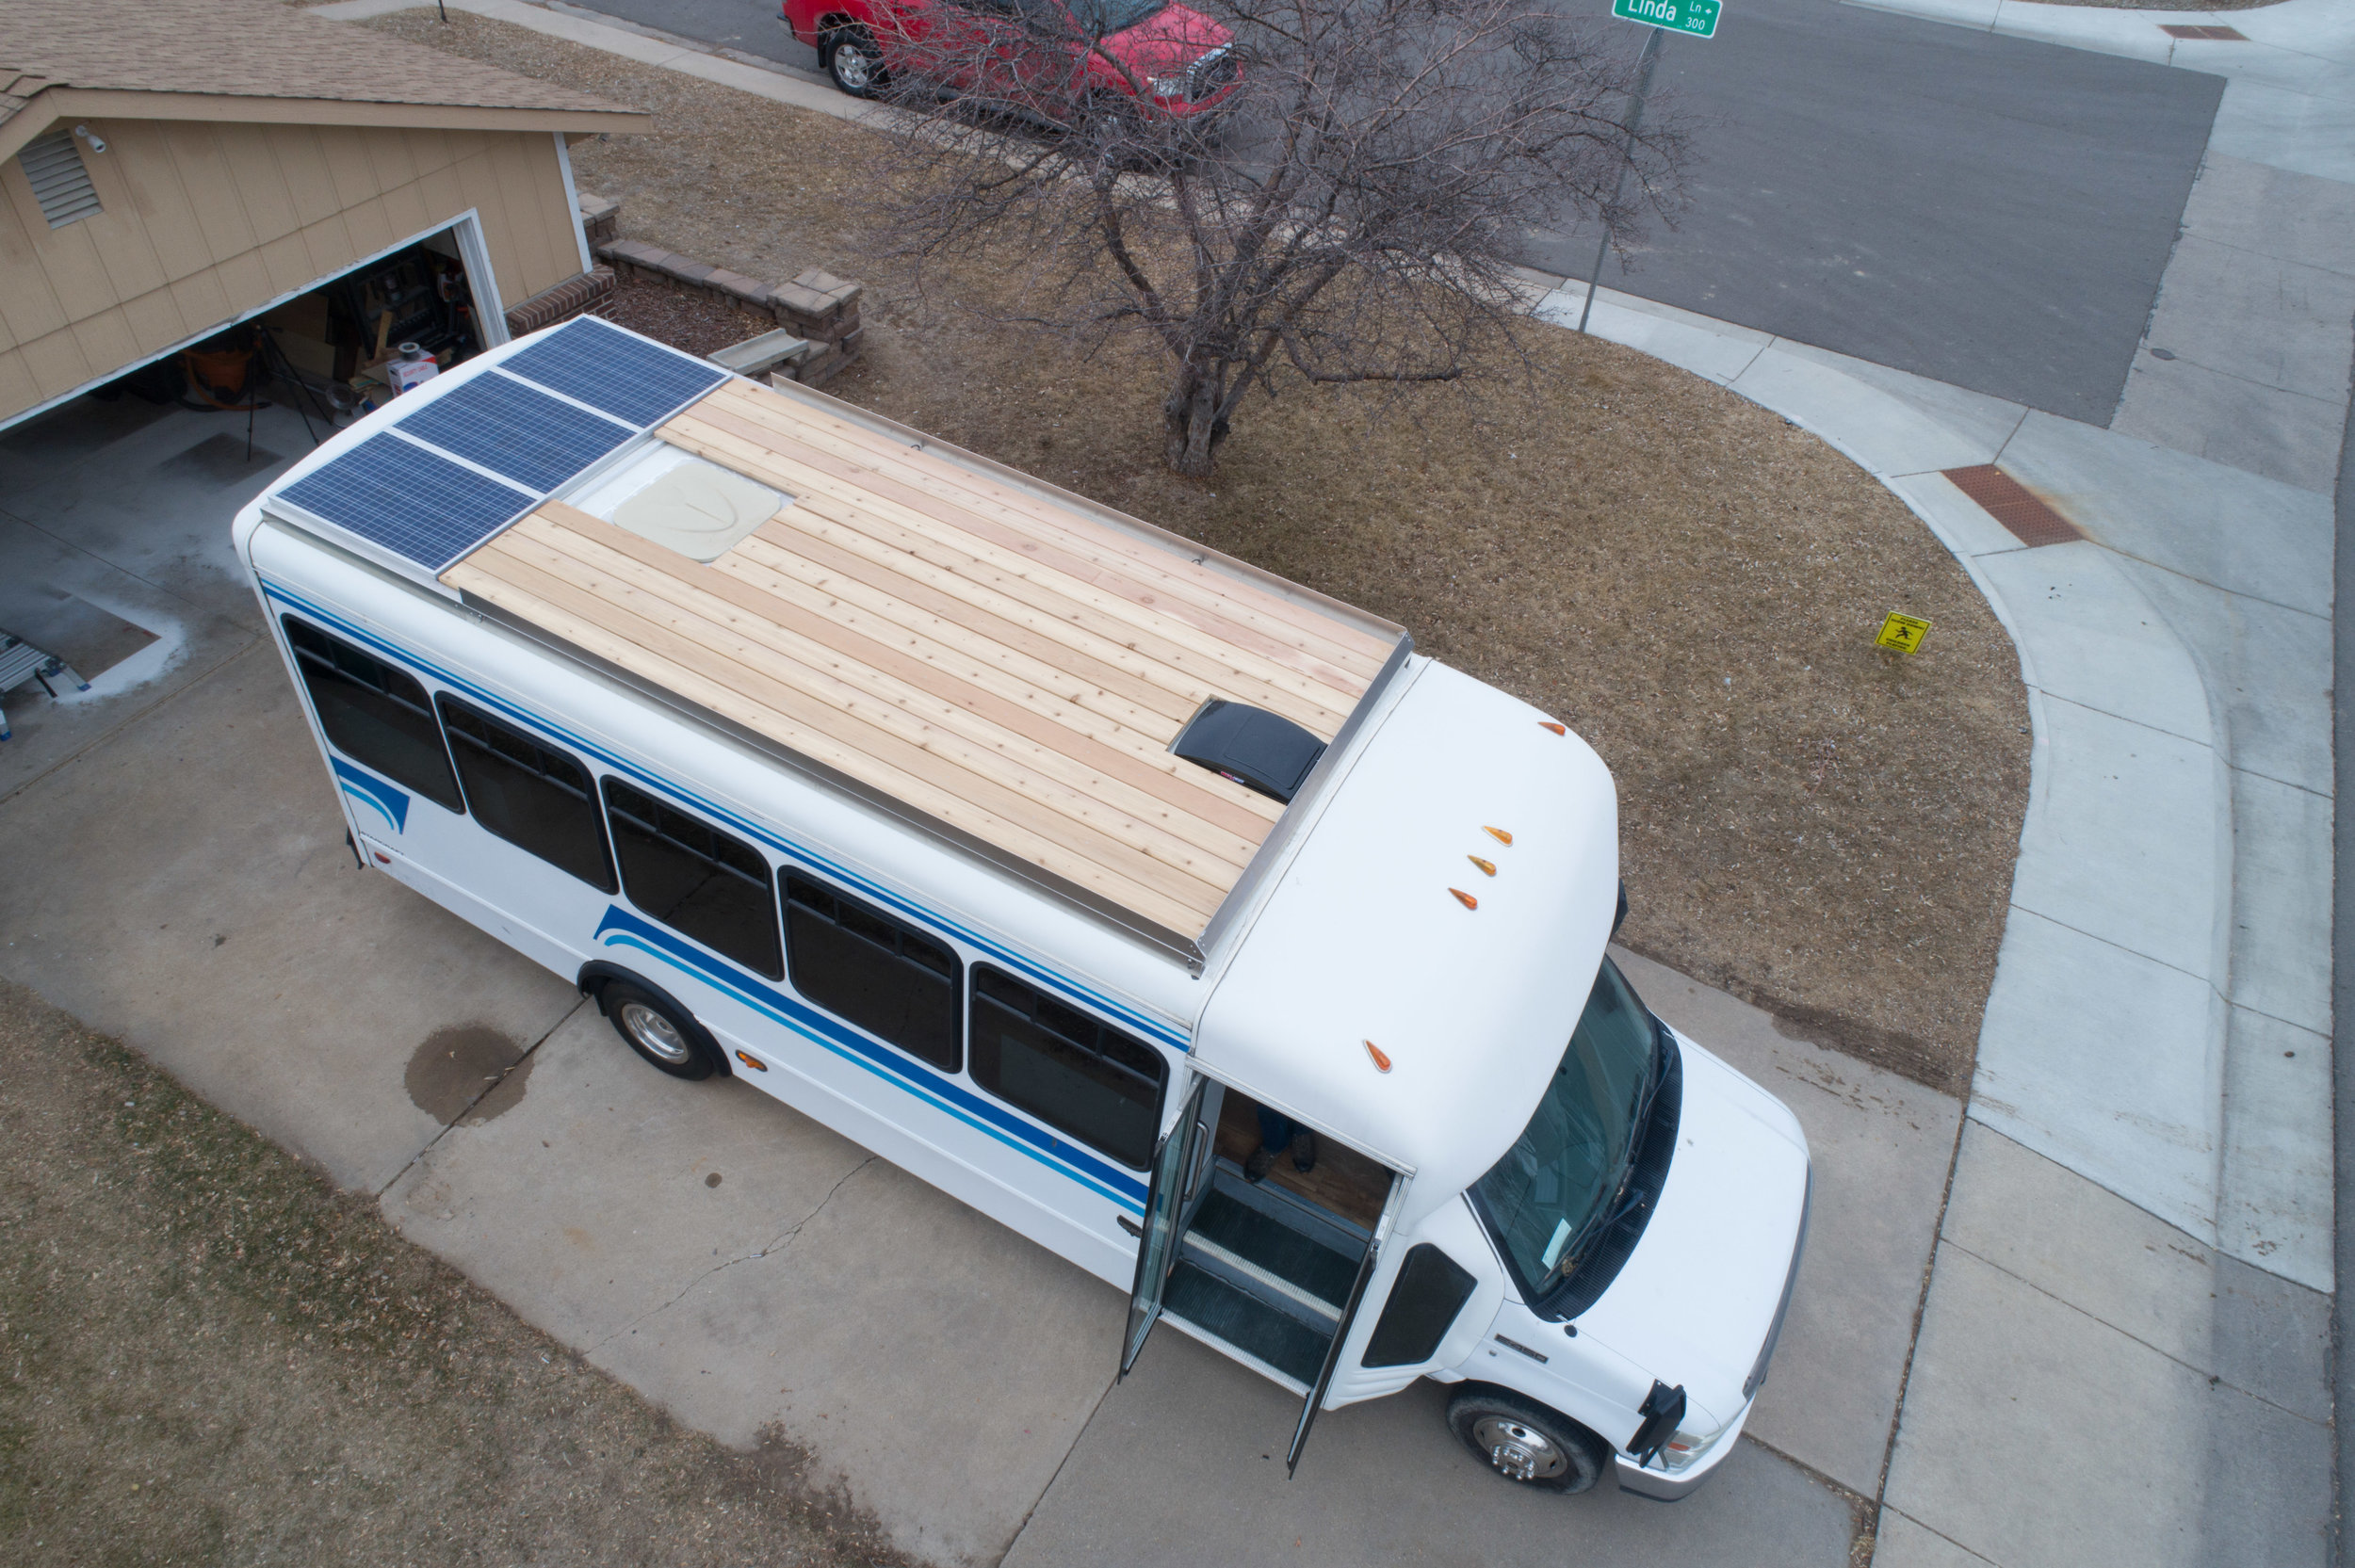 02.27.2019 Shuttle Bus Finish Photos Edit One Drone-5.jpg